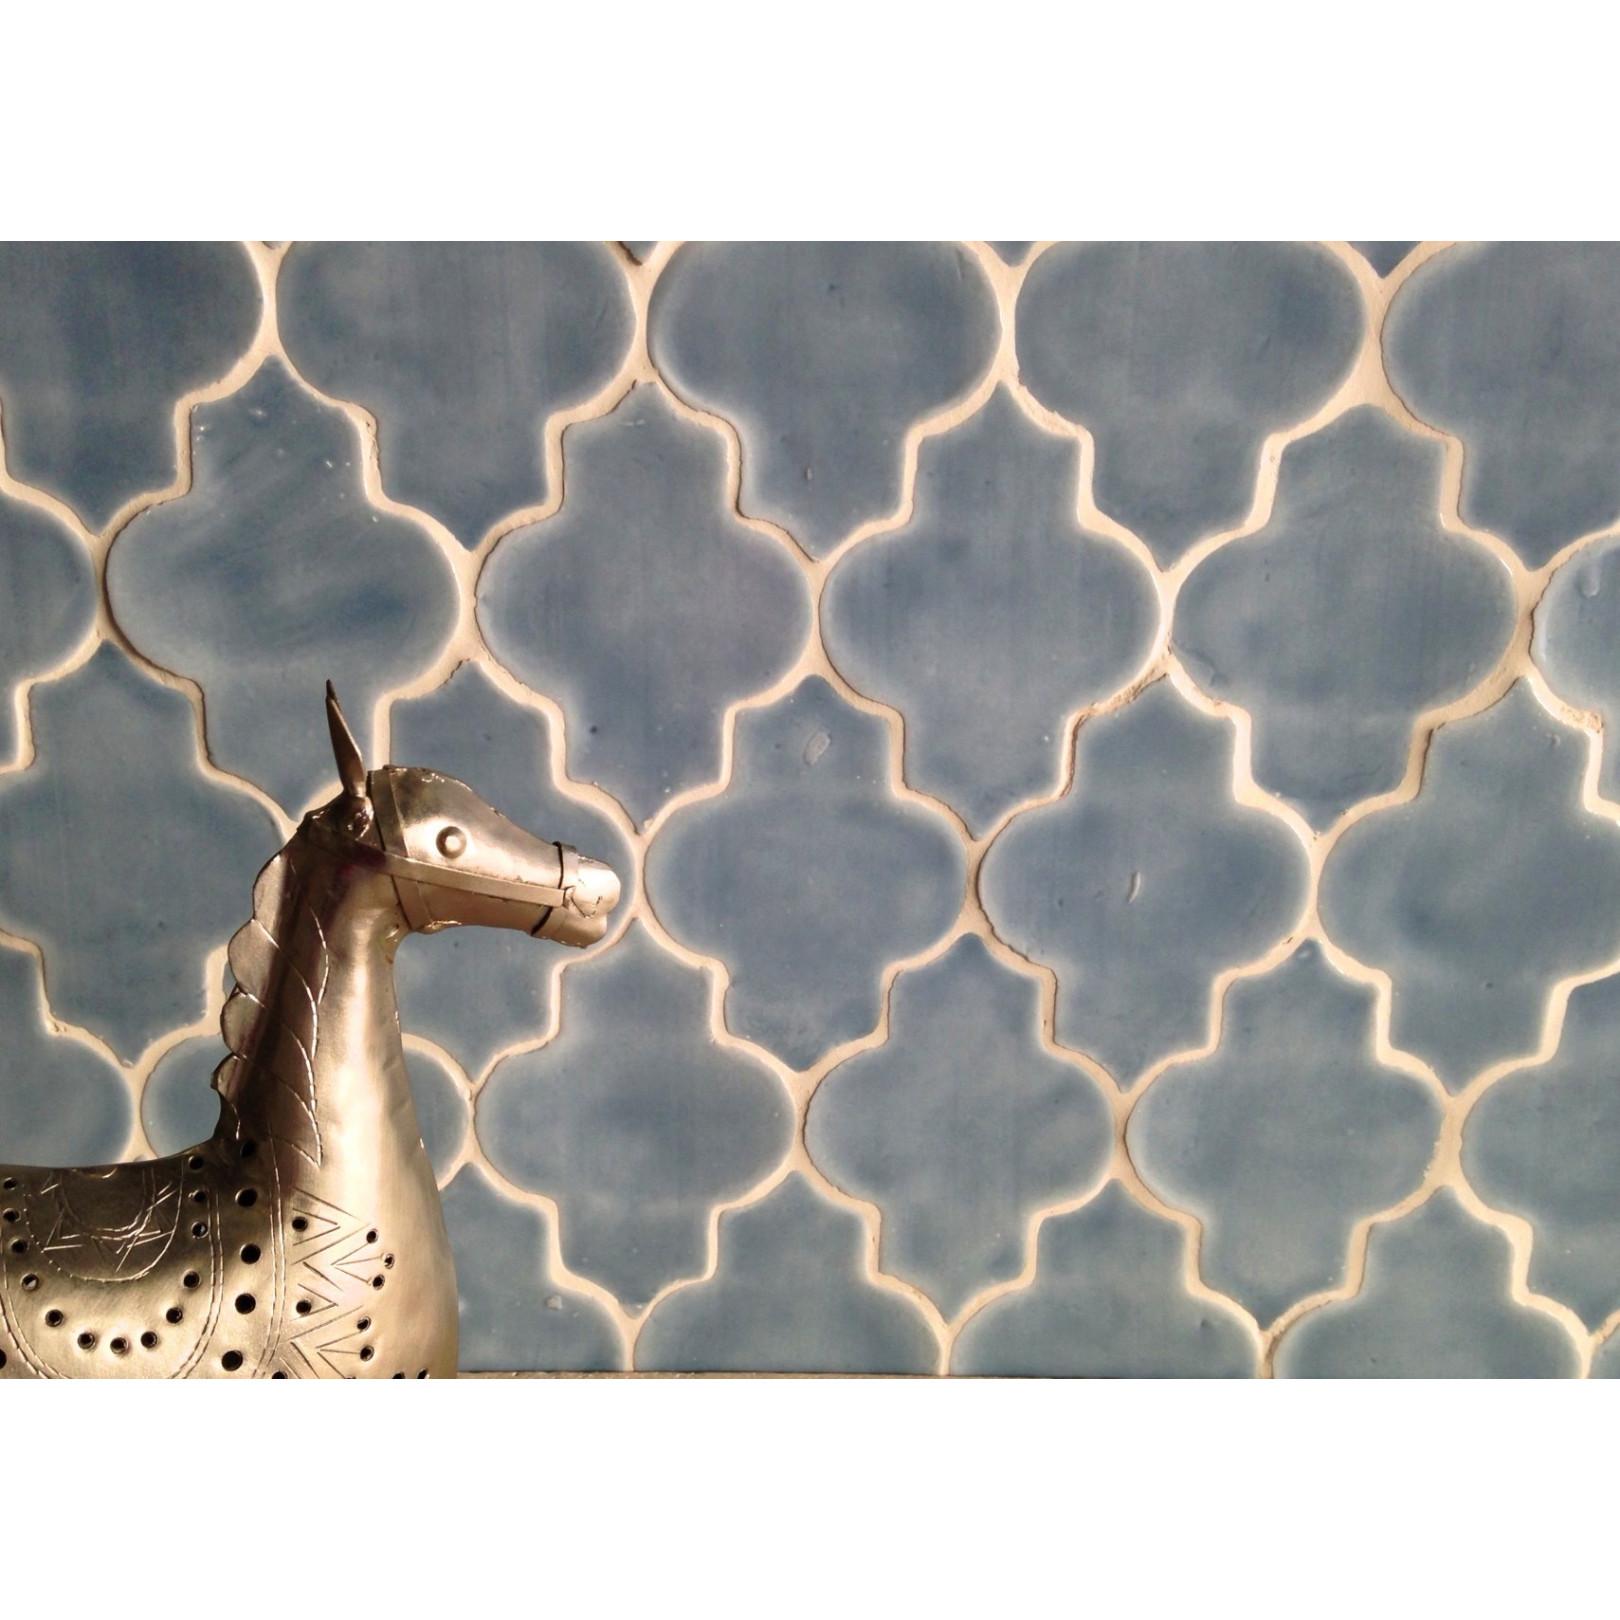 carrelage mural arabesque formt lanterne terre cuite maill e 18 couleurs casalux home design. Black Bedroom Furniture Sets. Home Design Ideas